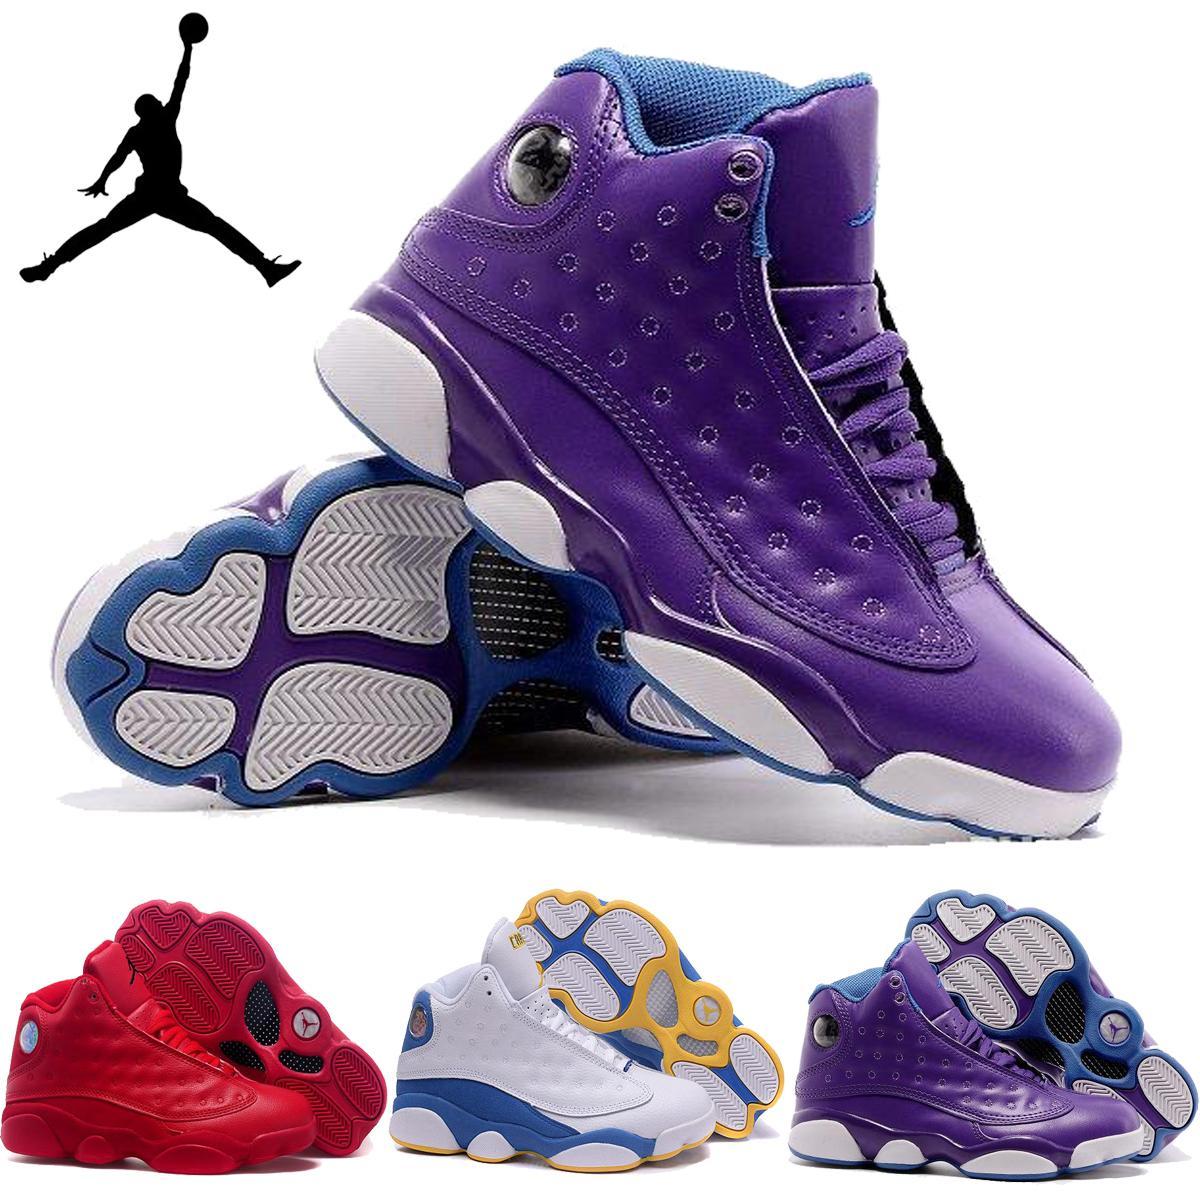 ea981eb8b722 ... where can i buy nike air jordan 13 xiii gs strawberry lavender violet  womens basketball shoes